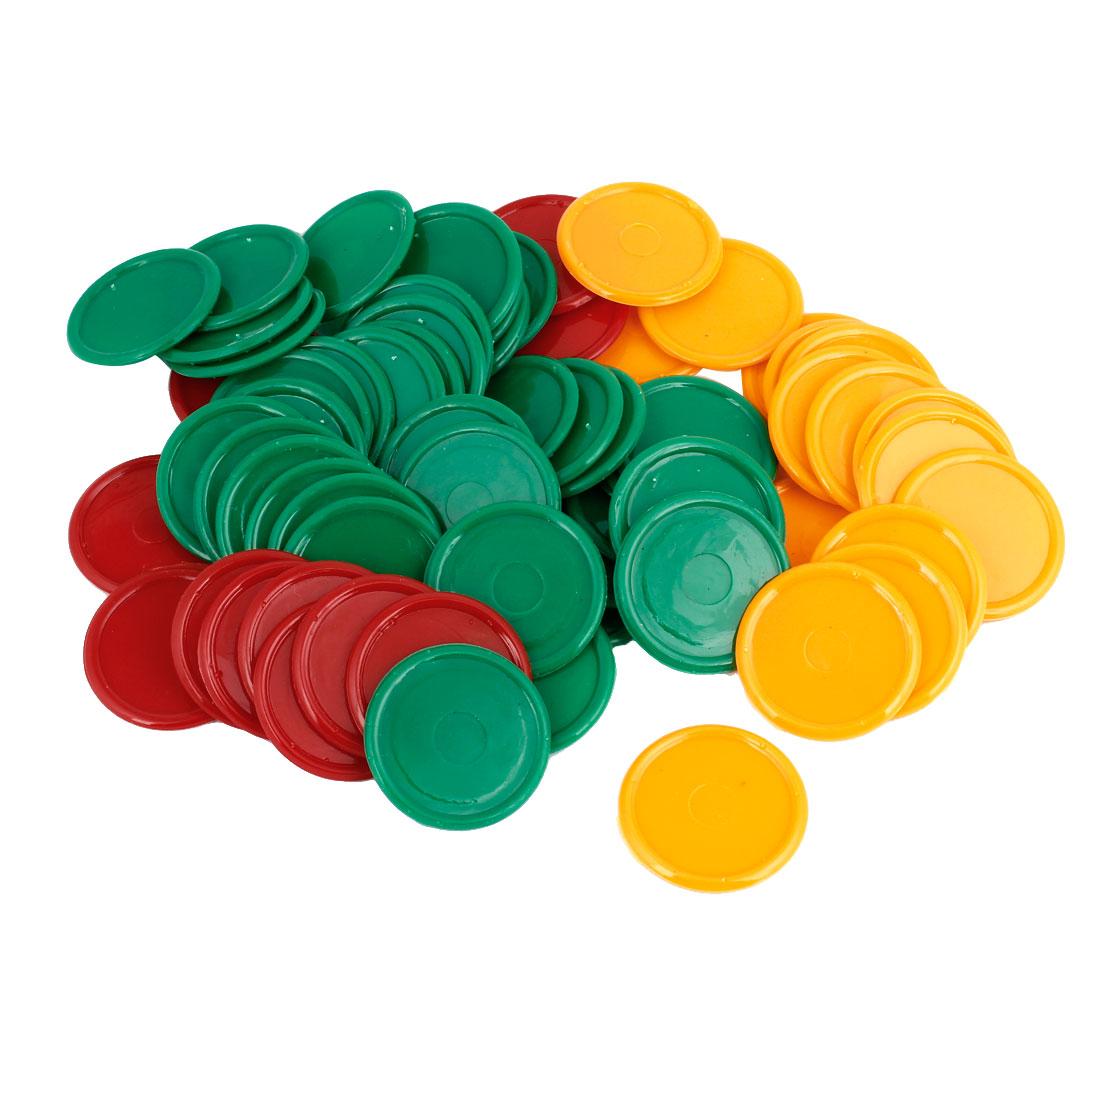 Unique Bargains Plastic Poker Chips Set Round Shape Green Yellow Red 68 Pcs